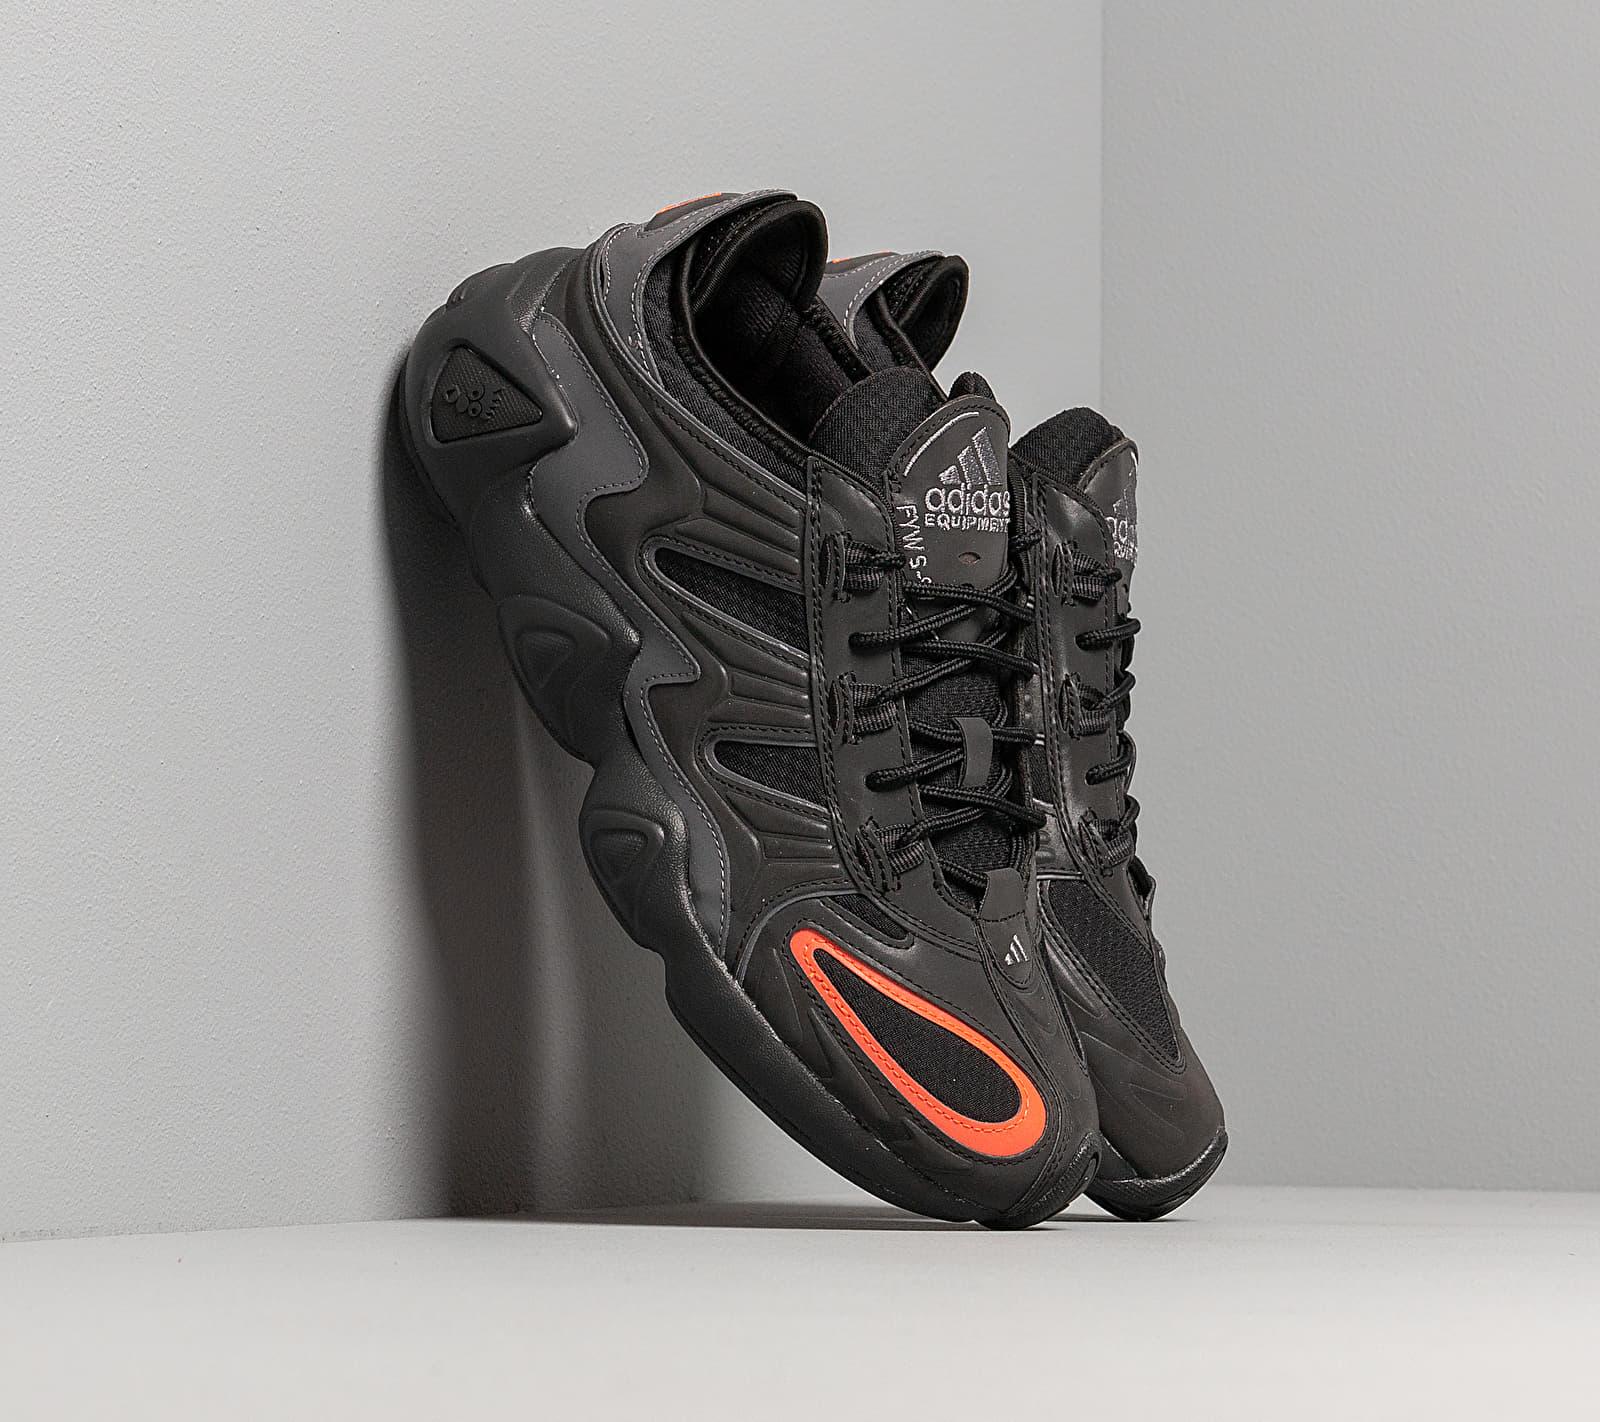 adidas FYW S-97 Core Black/ Core Black/ Solar Red EE5314